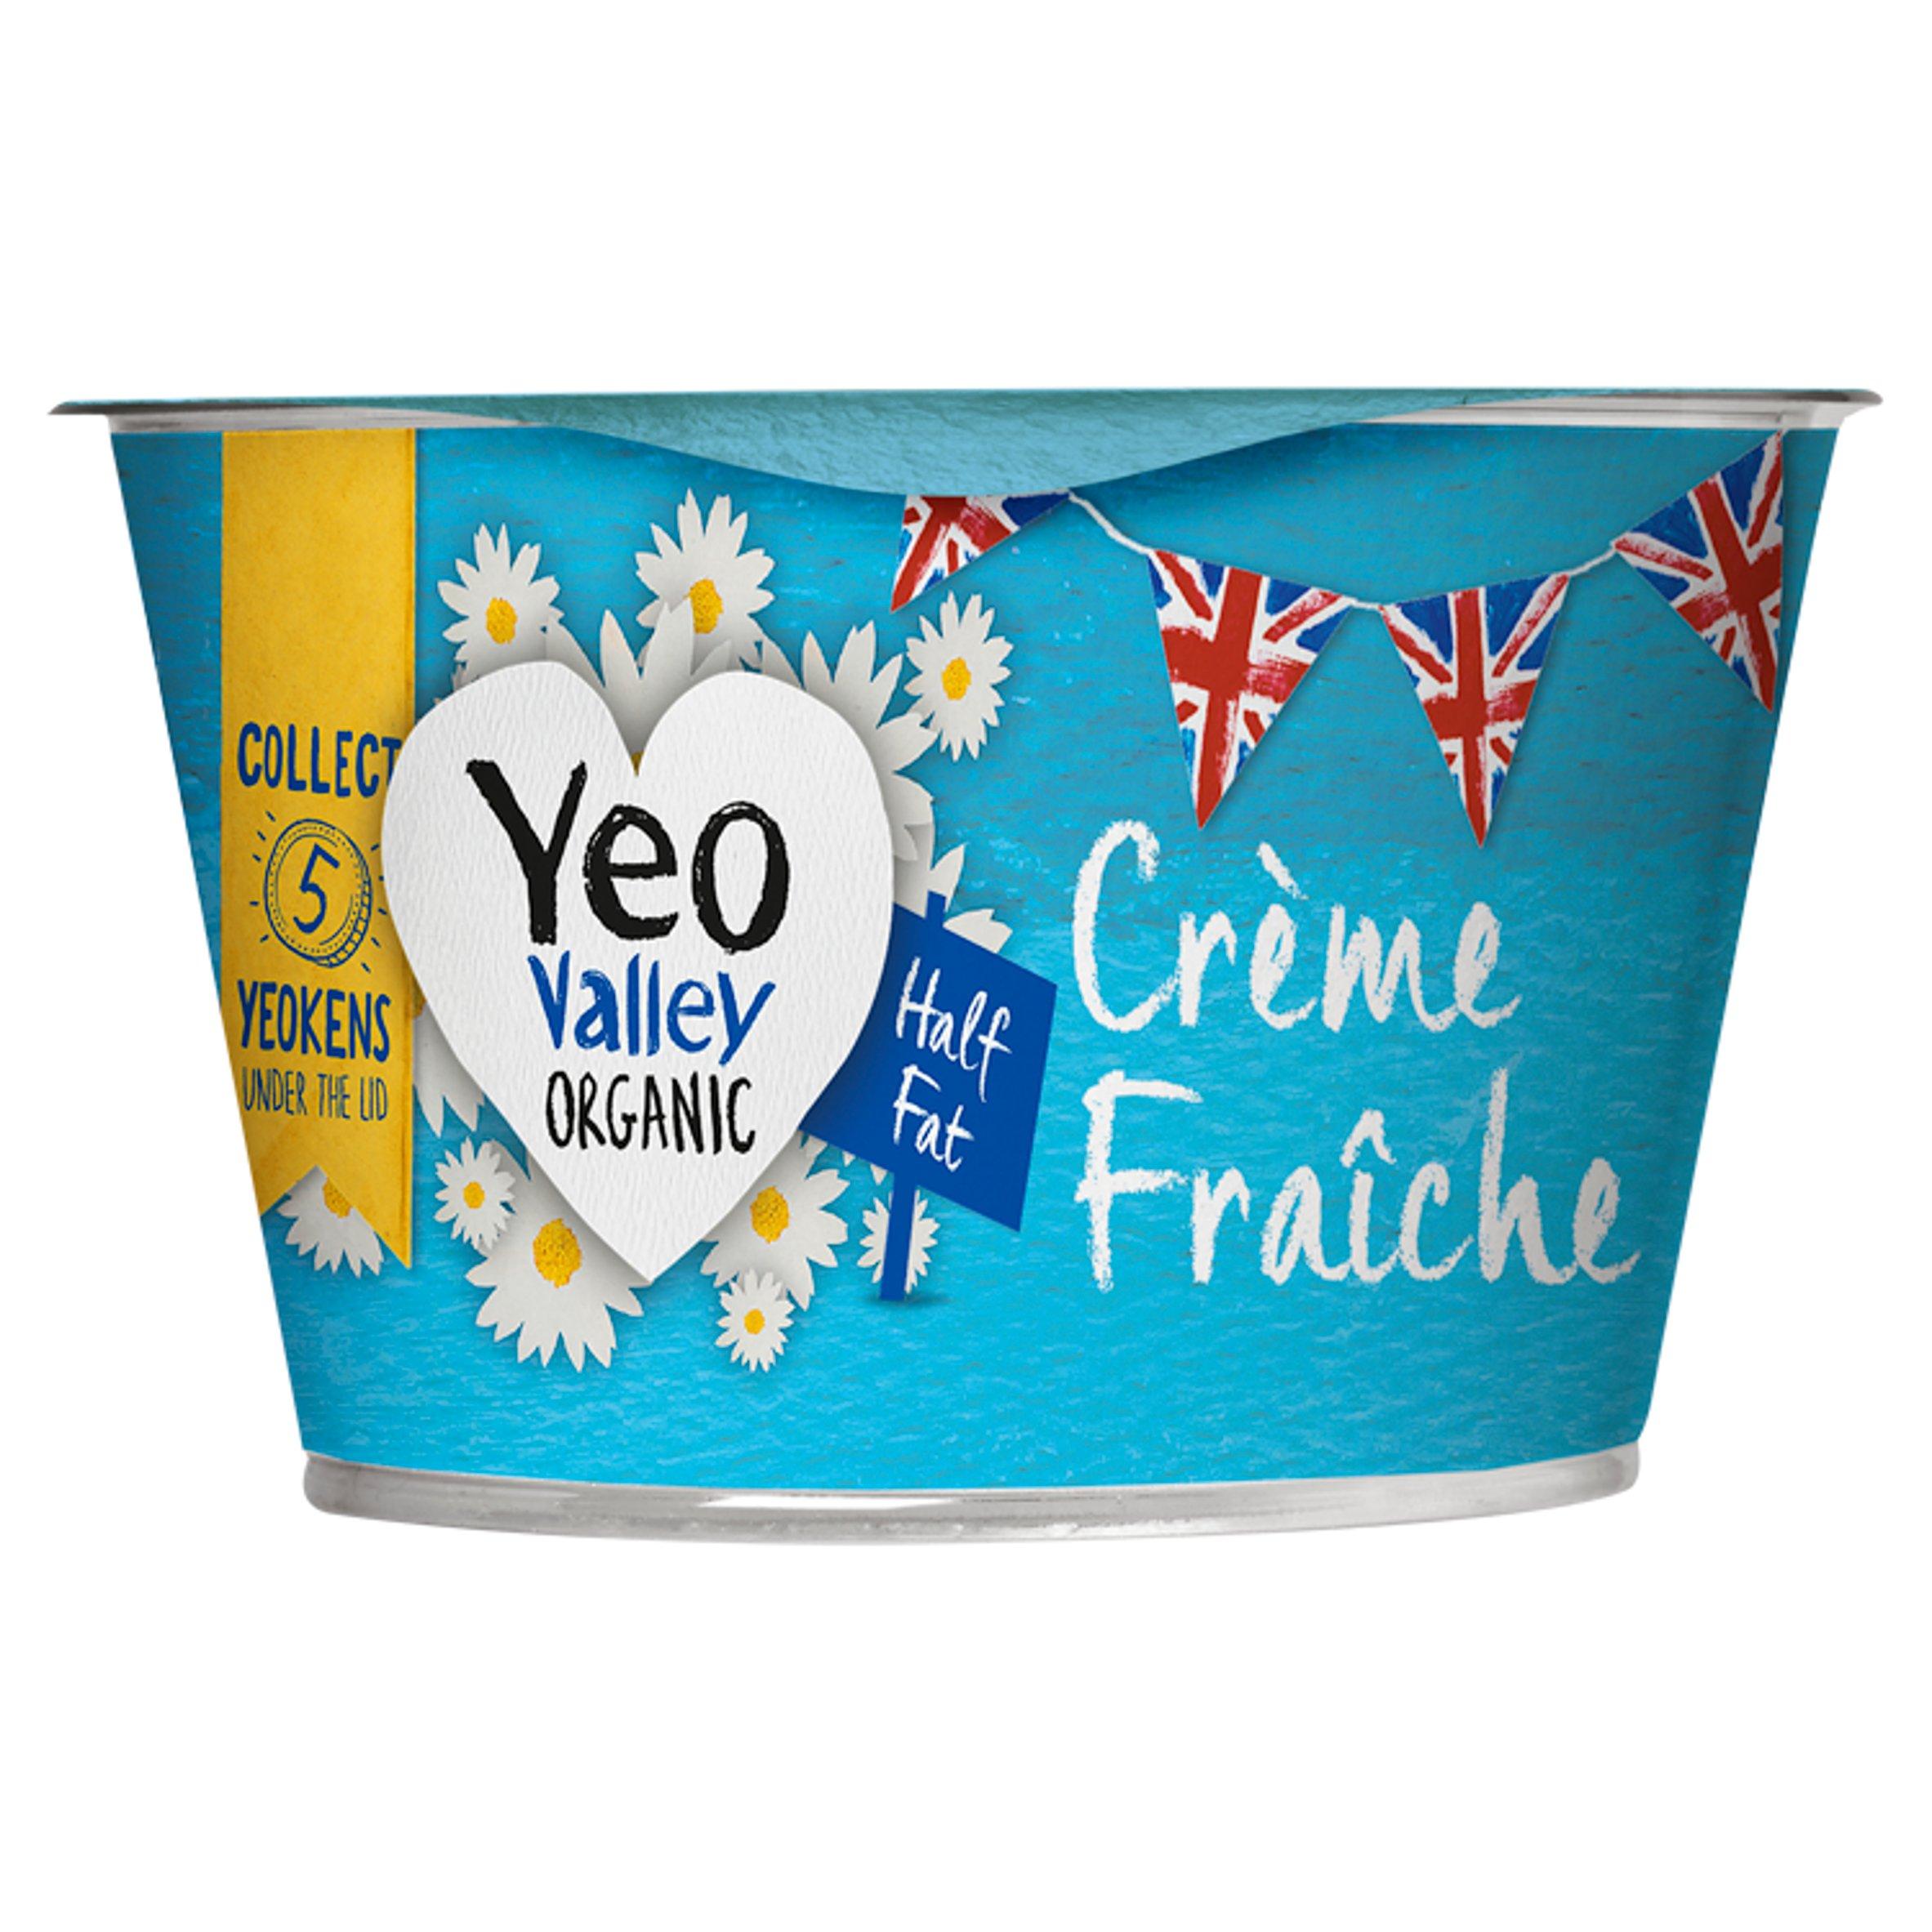 Yeo Valley Half Fat Organic Creme Fraiche 200G